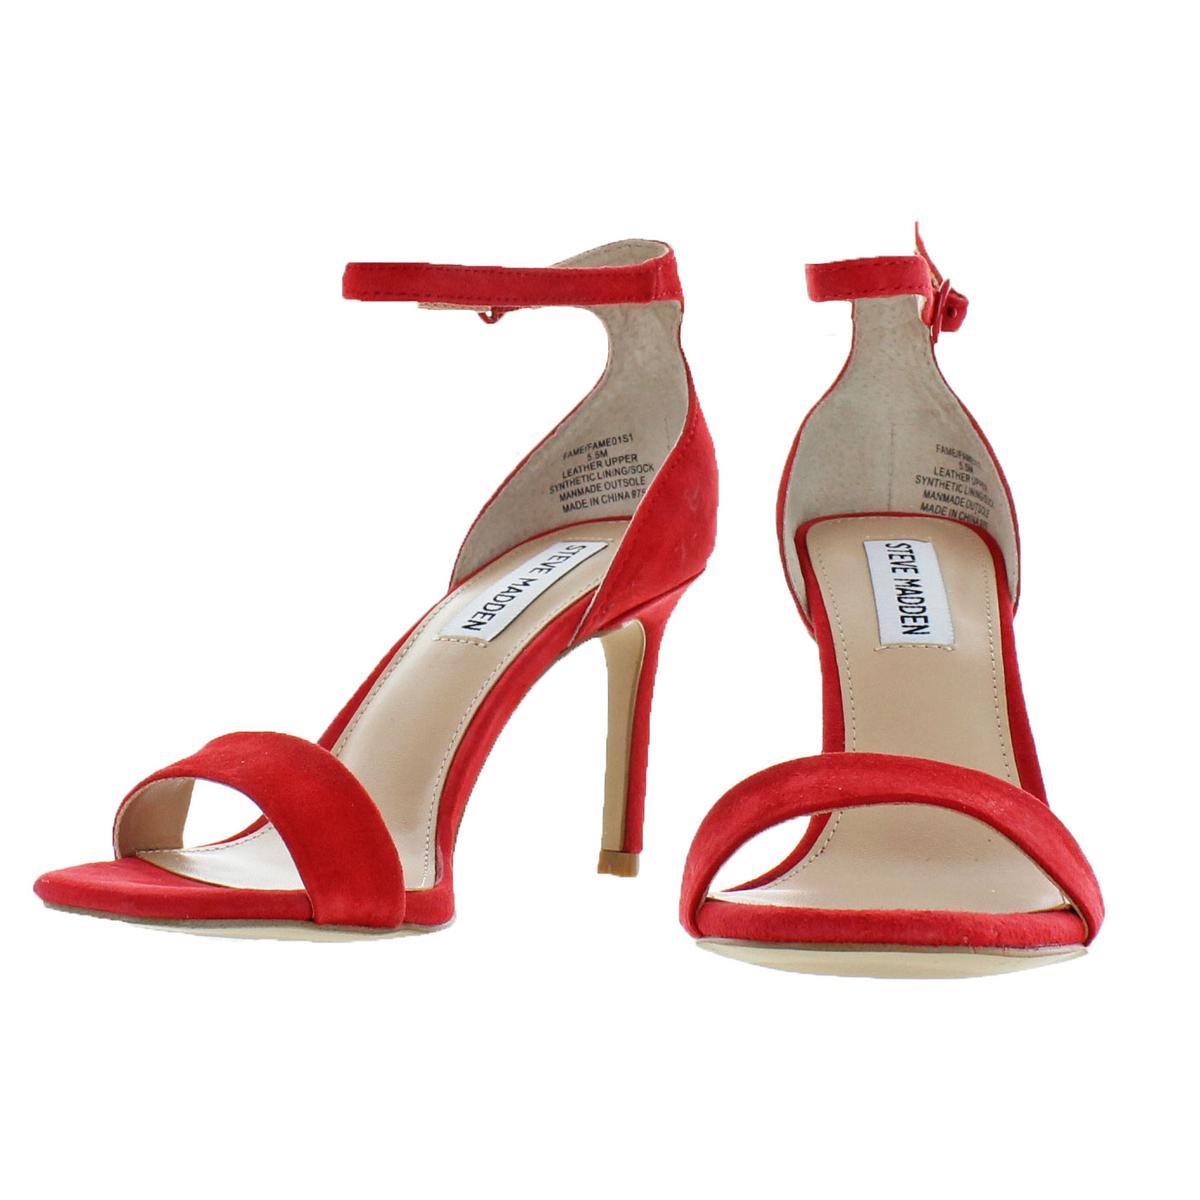 d5a2630ee0e Steve Madden Womens Fame Padded Insole Open Toe Evening Sandals ...